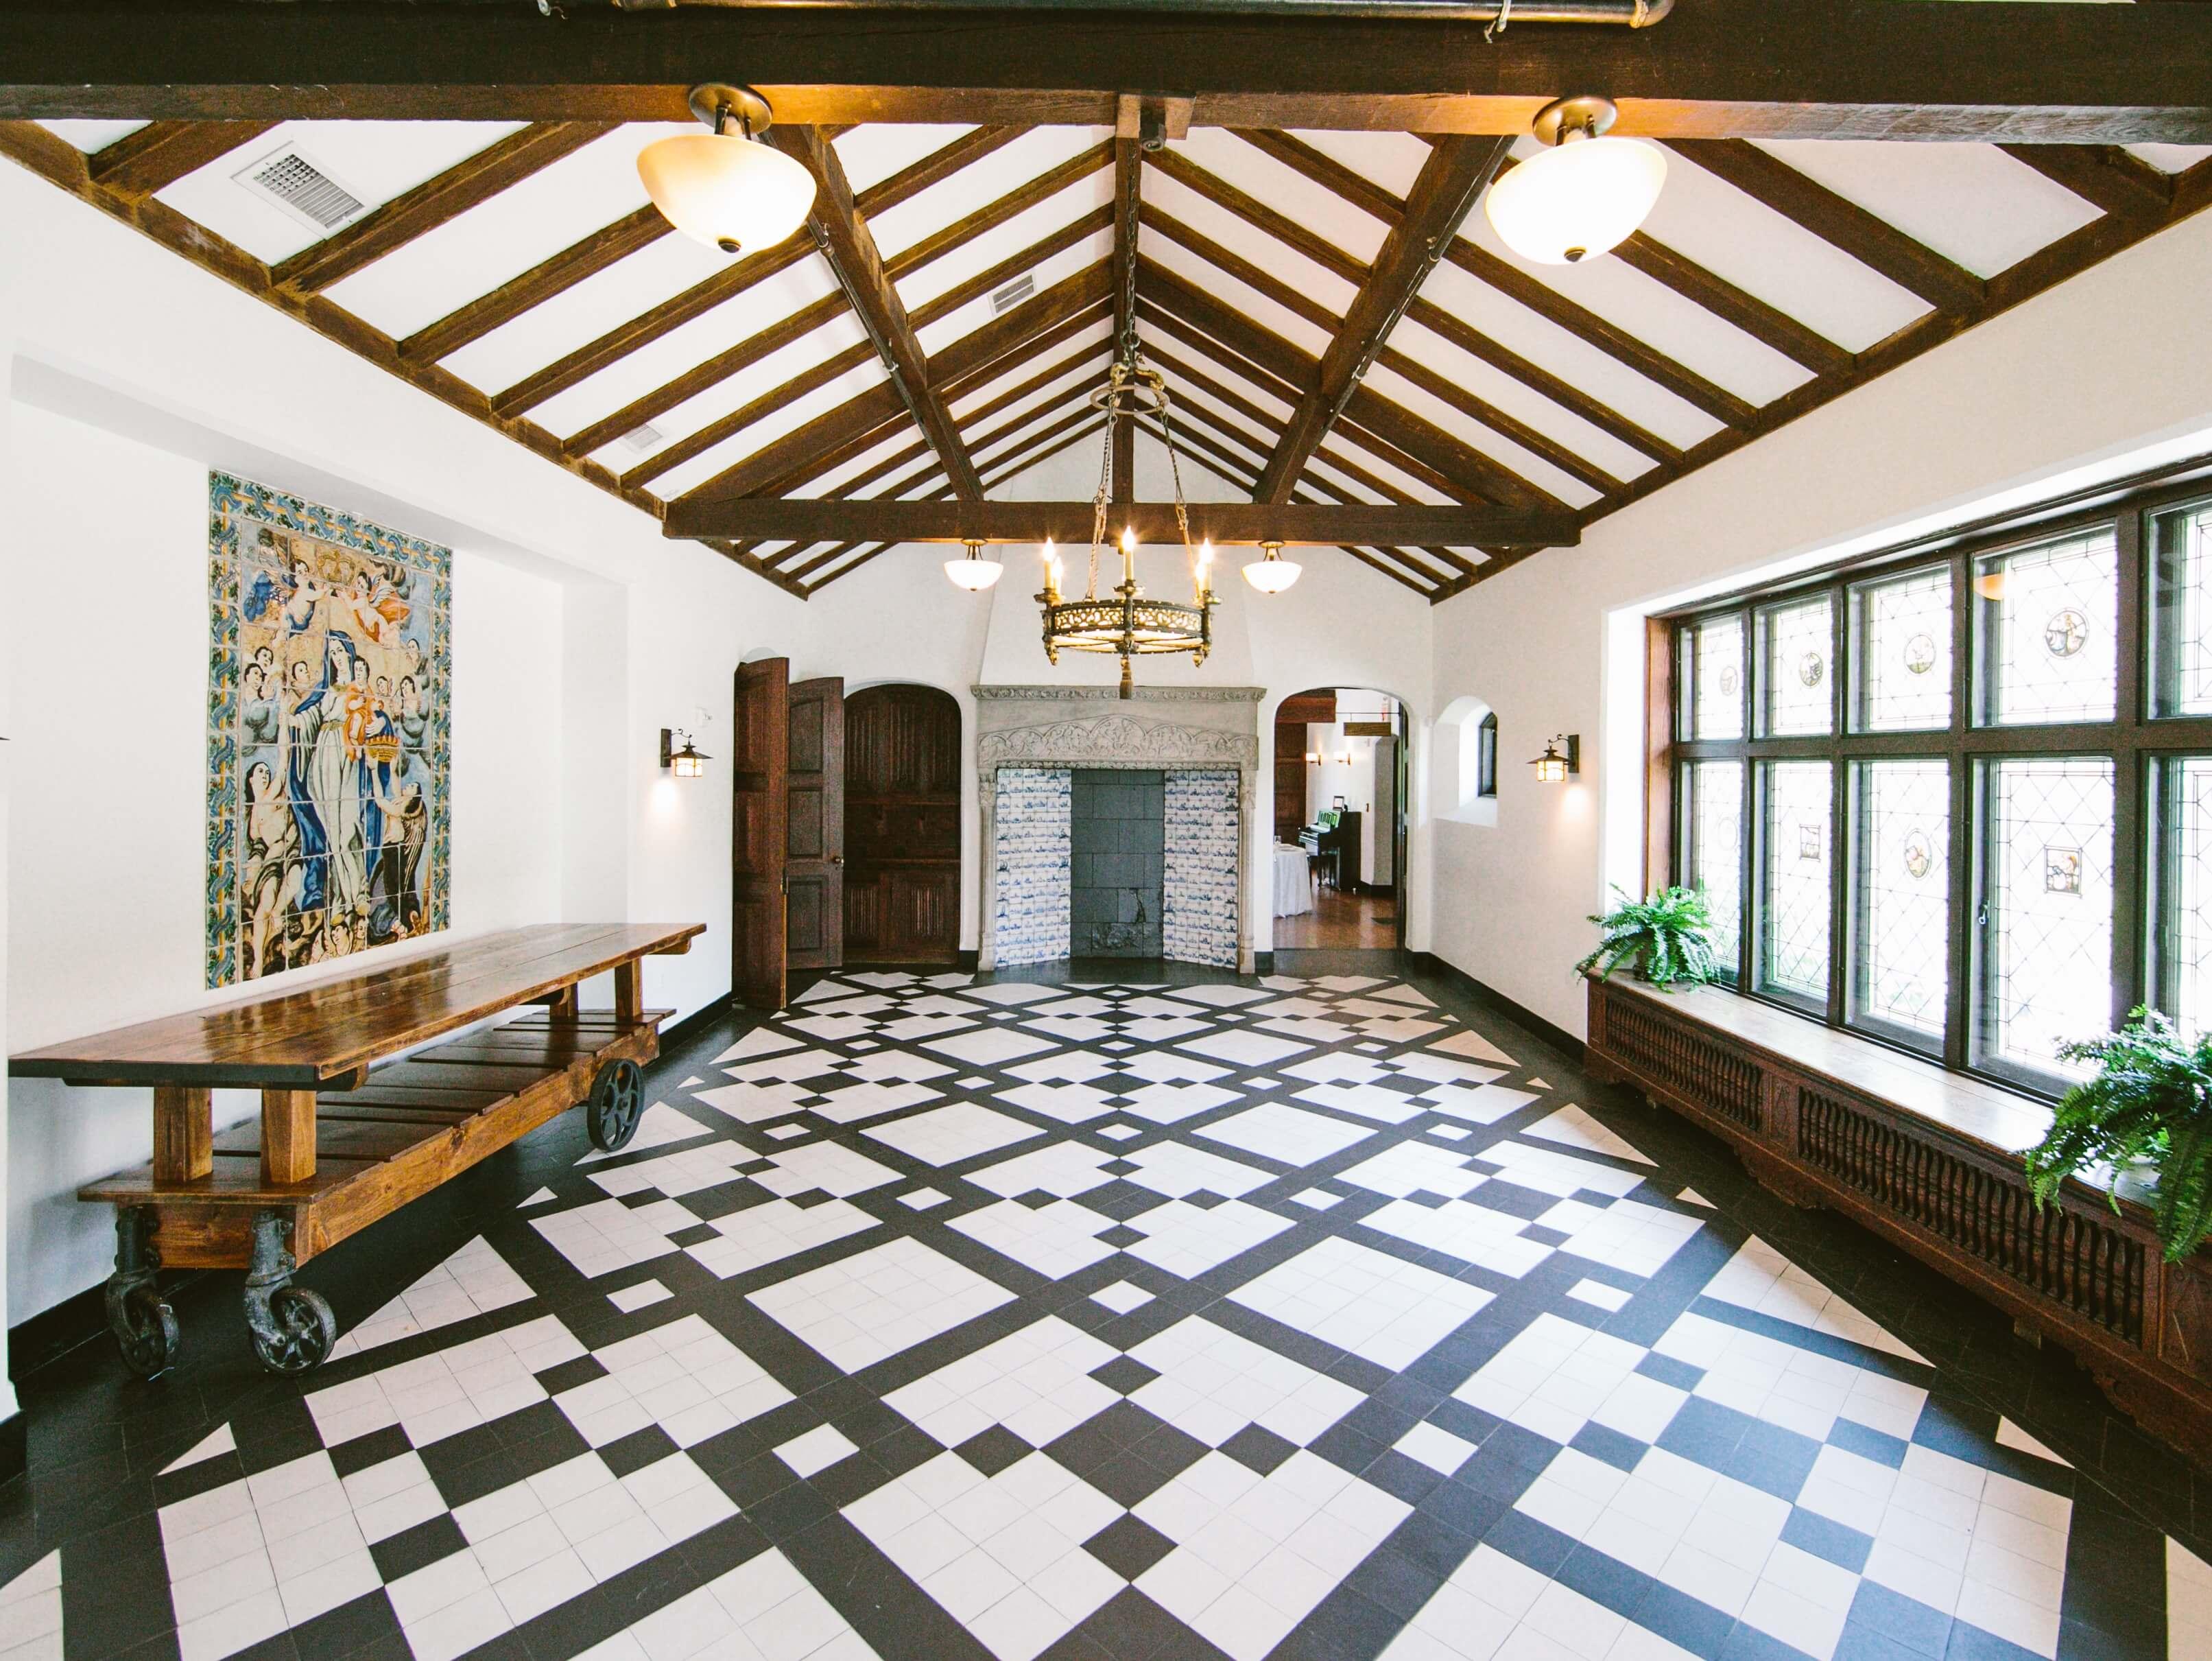 Best Tile Ideas For Home Renovation For 2022